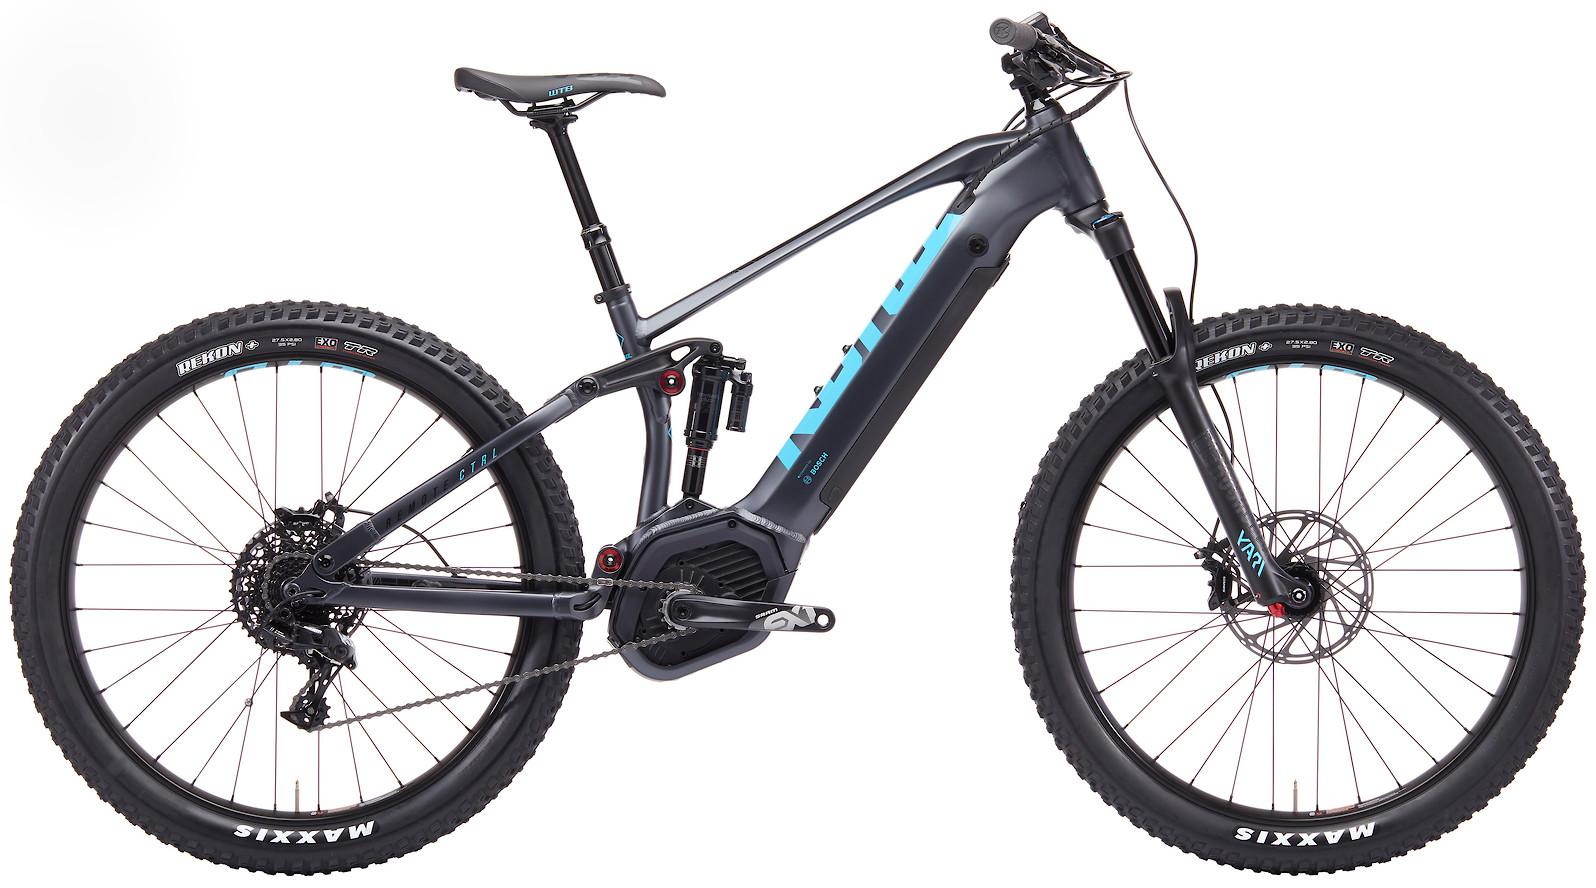 2019 Kona Remote CTRL E-bike